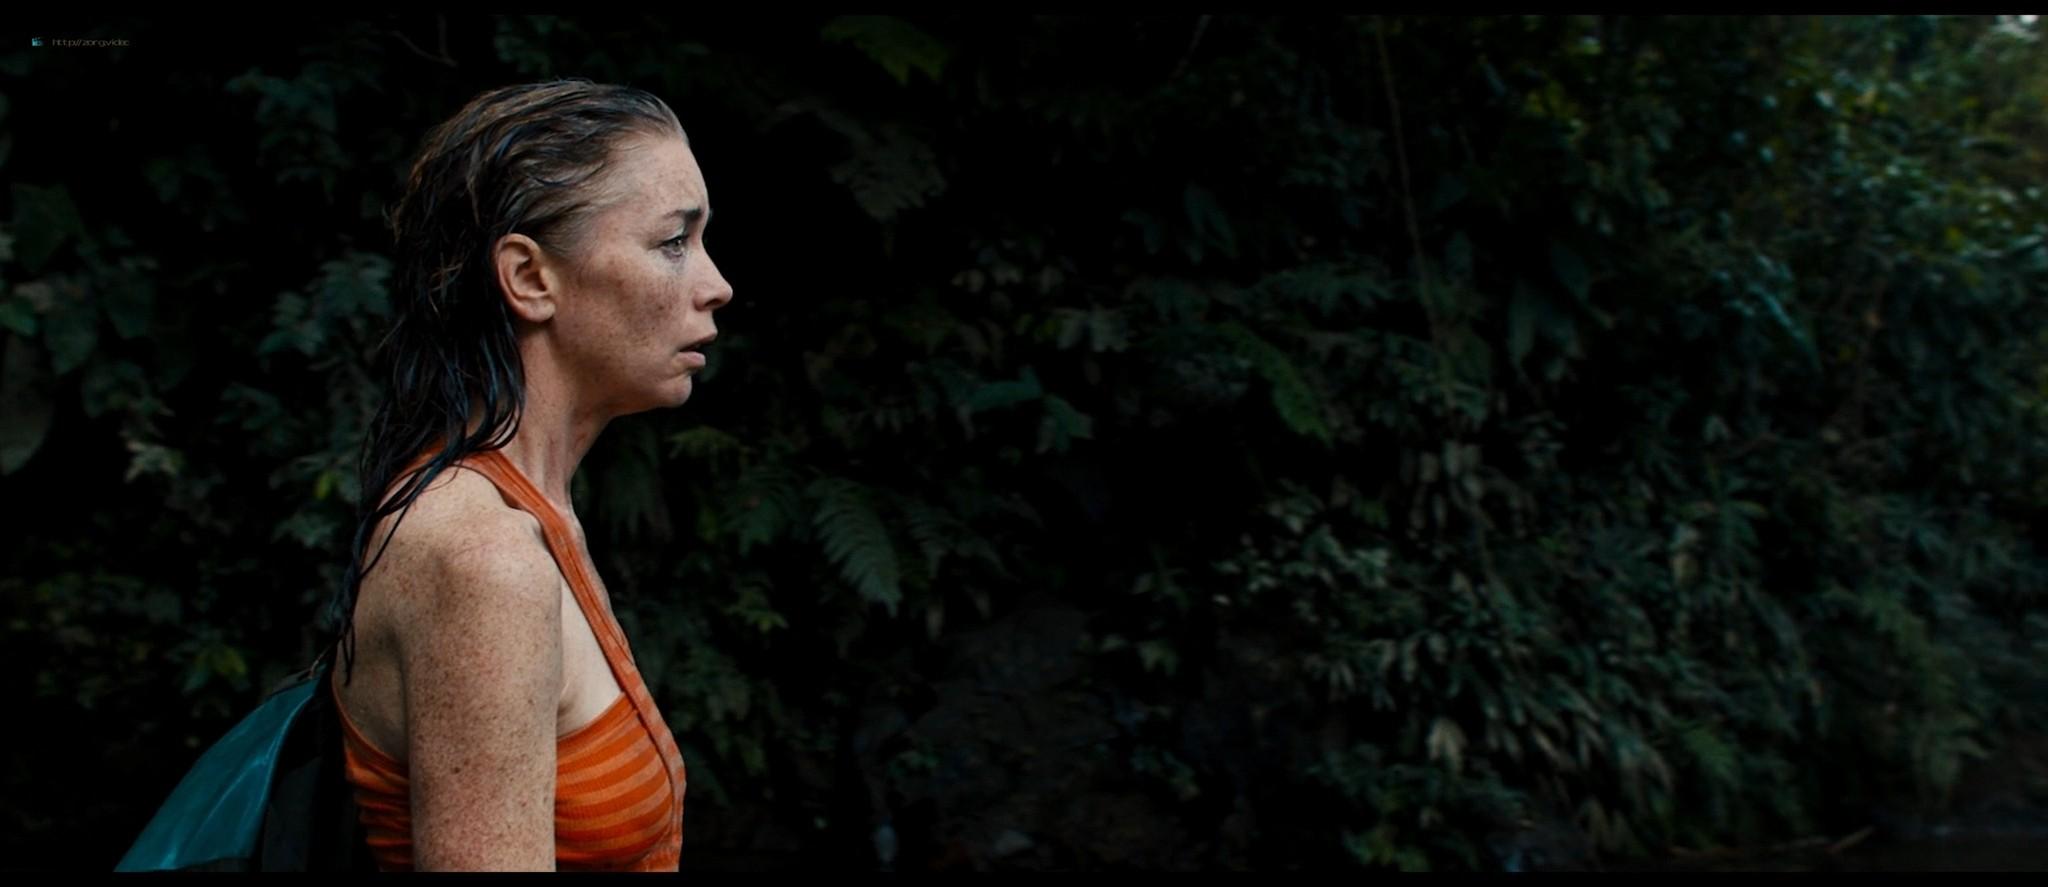 Julianne Nicholson pokies Karen Quintero, Laura Castrillón sexy - Monos (2019) HD 1080p BluRay (8)